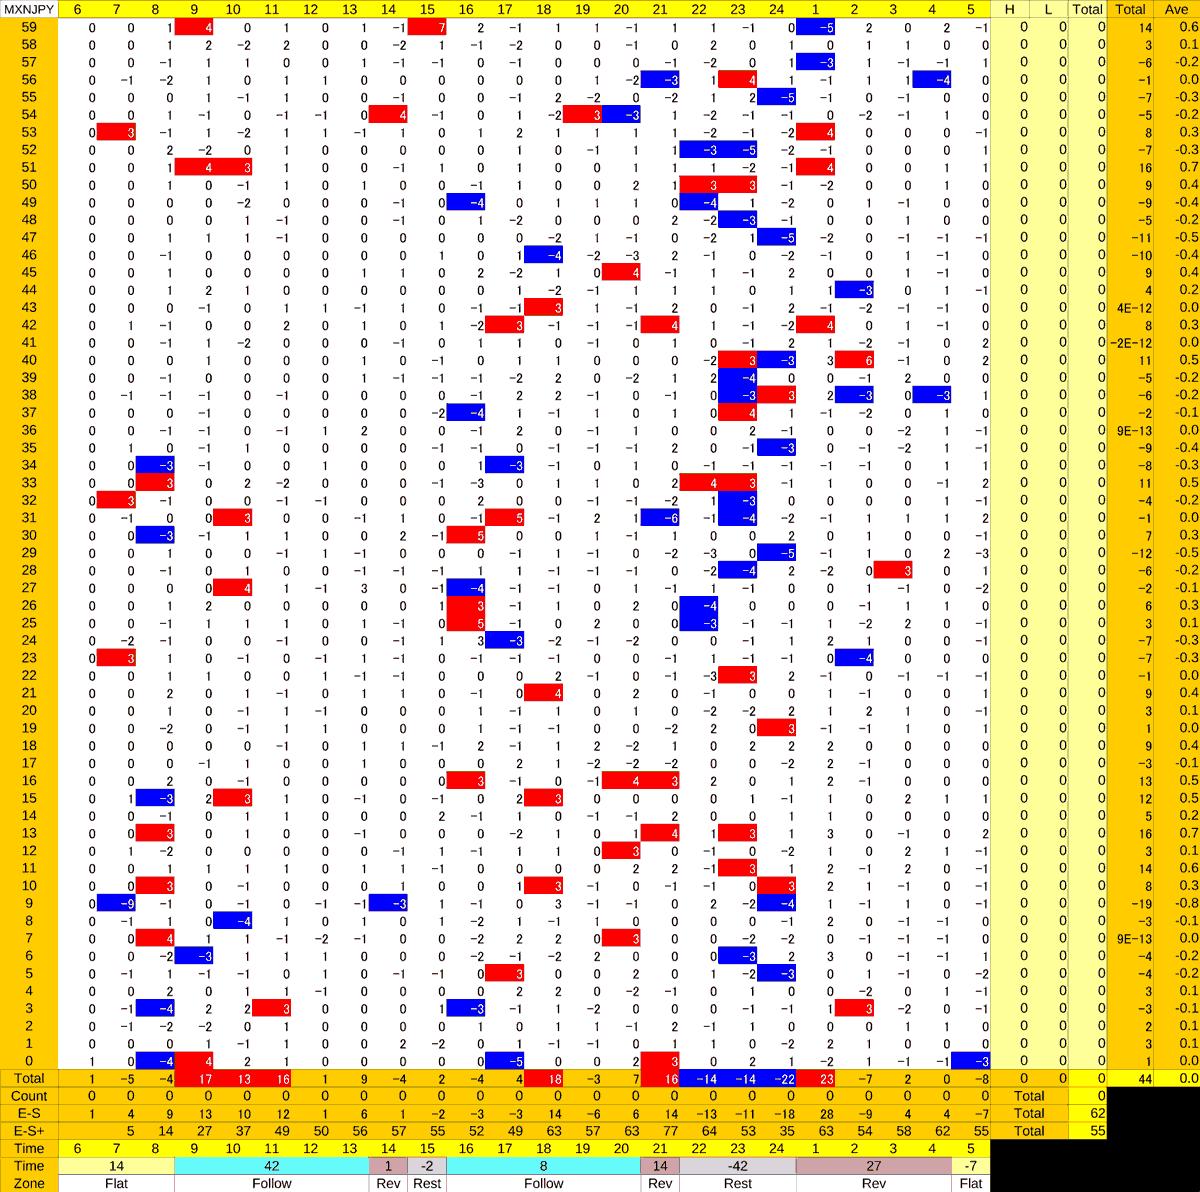 20210201_HS(3)MXNJPY